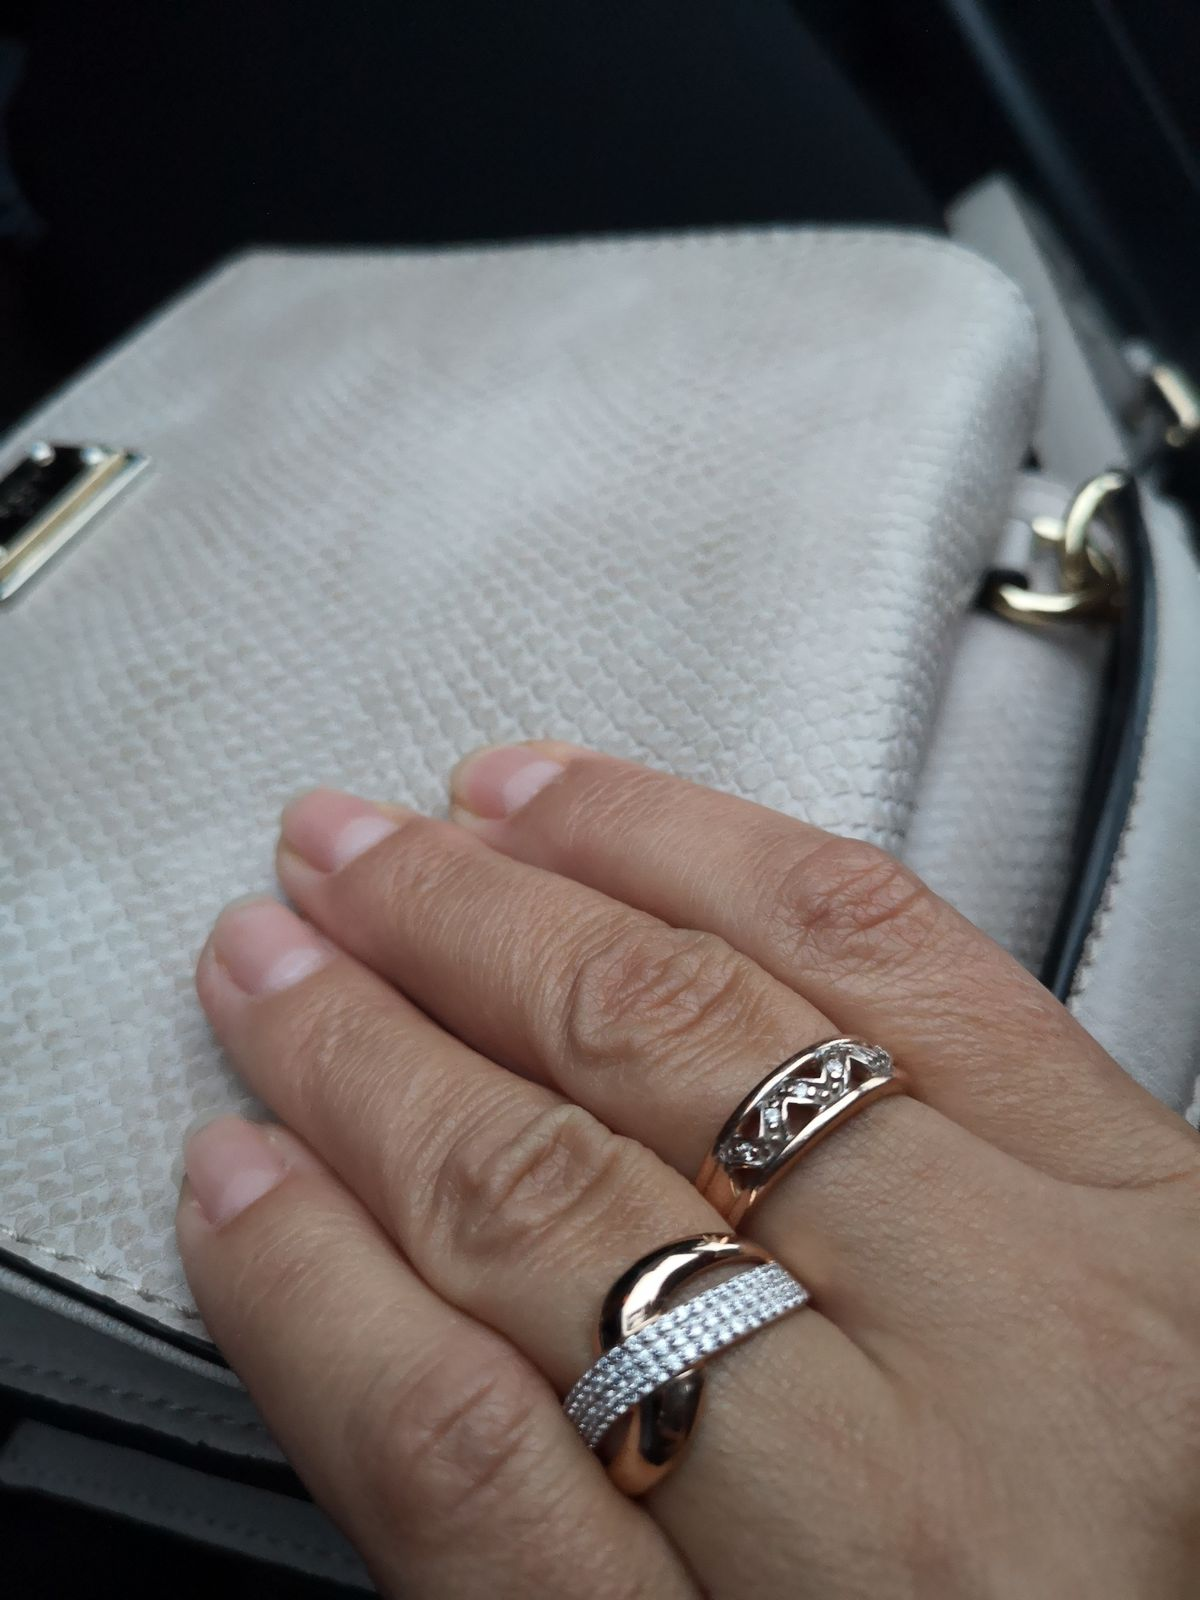 Не реально красивое кольцо